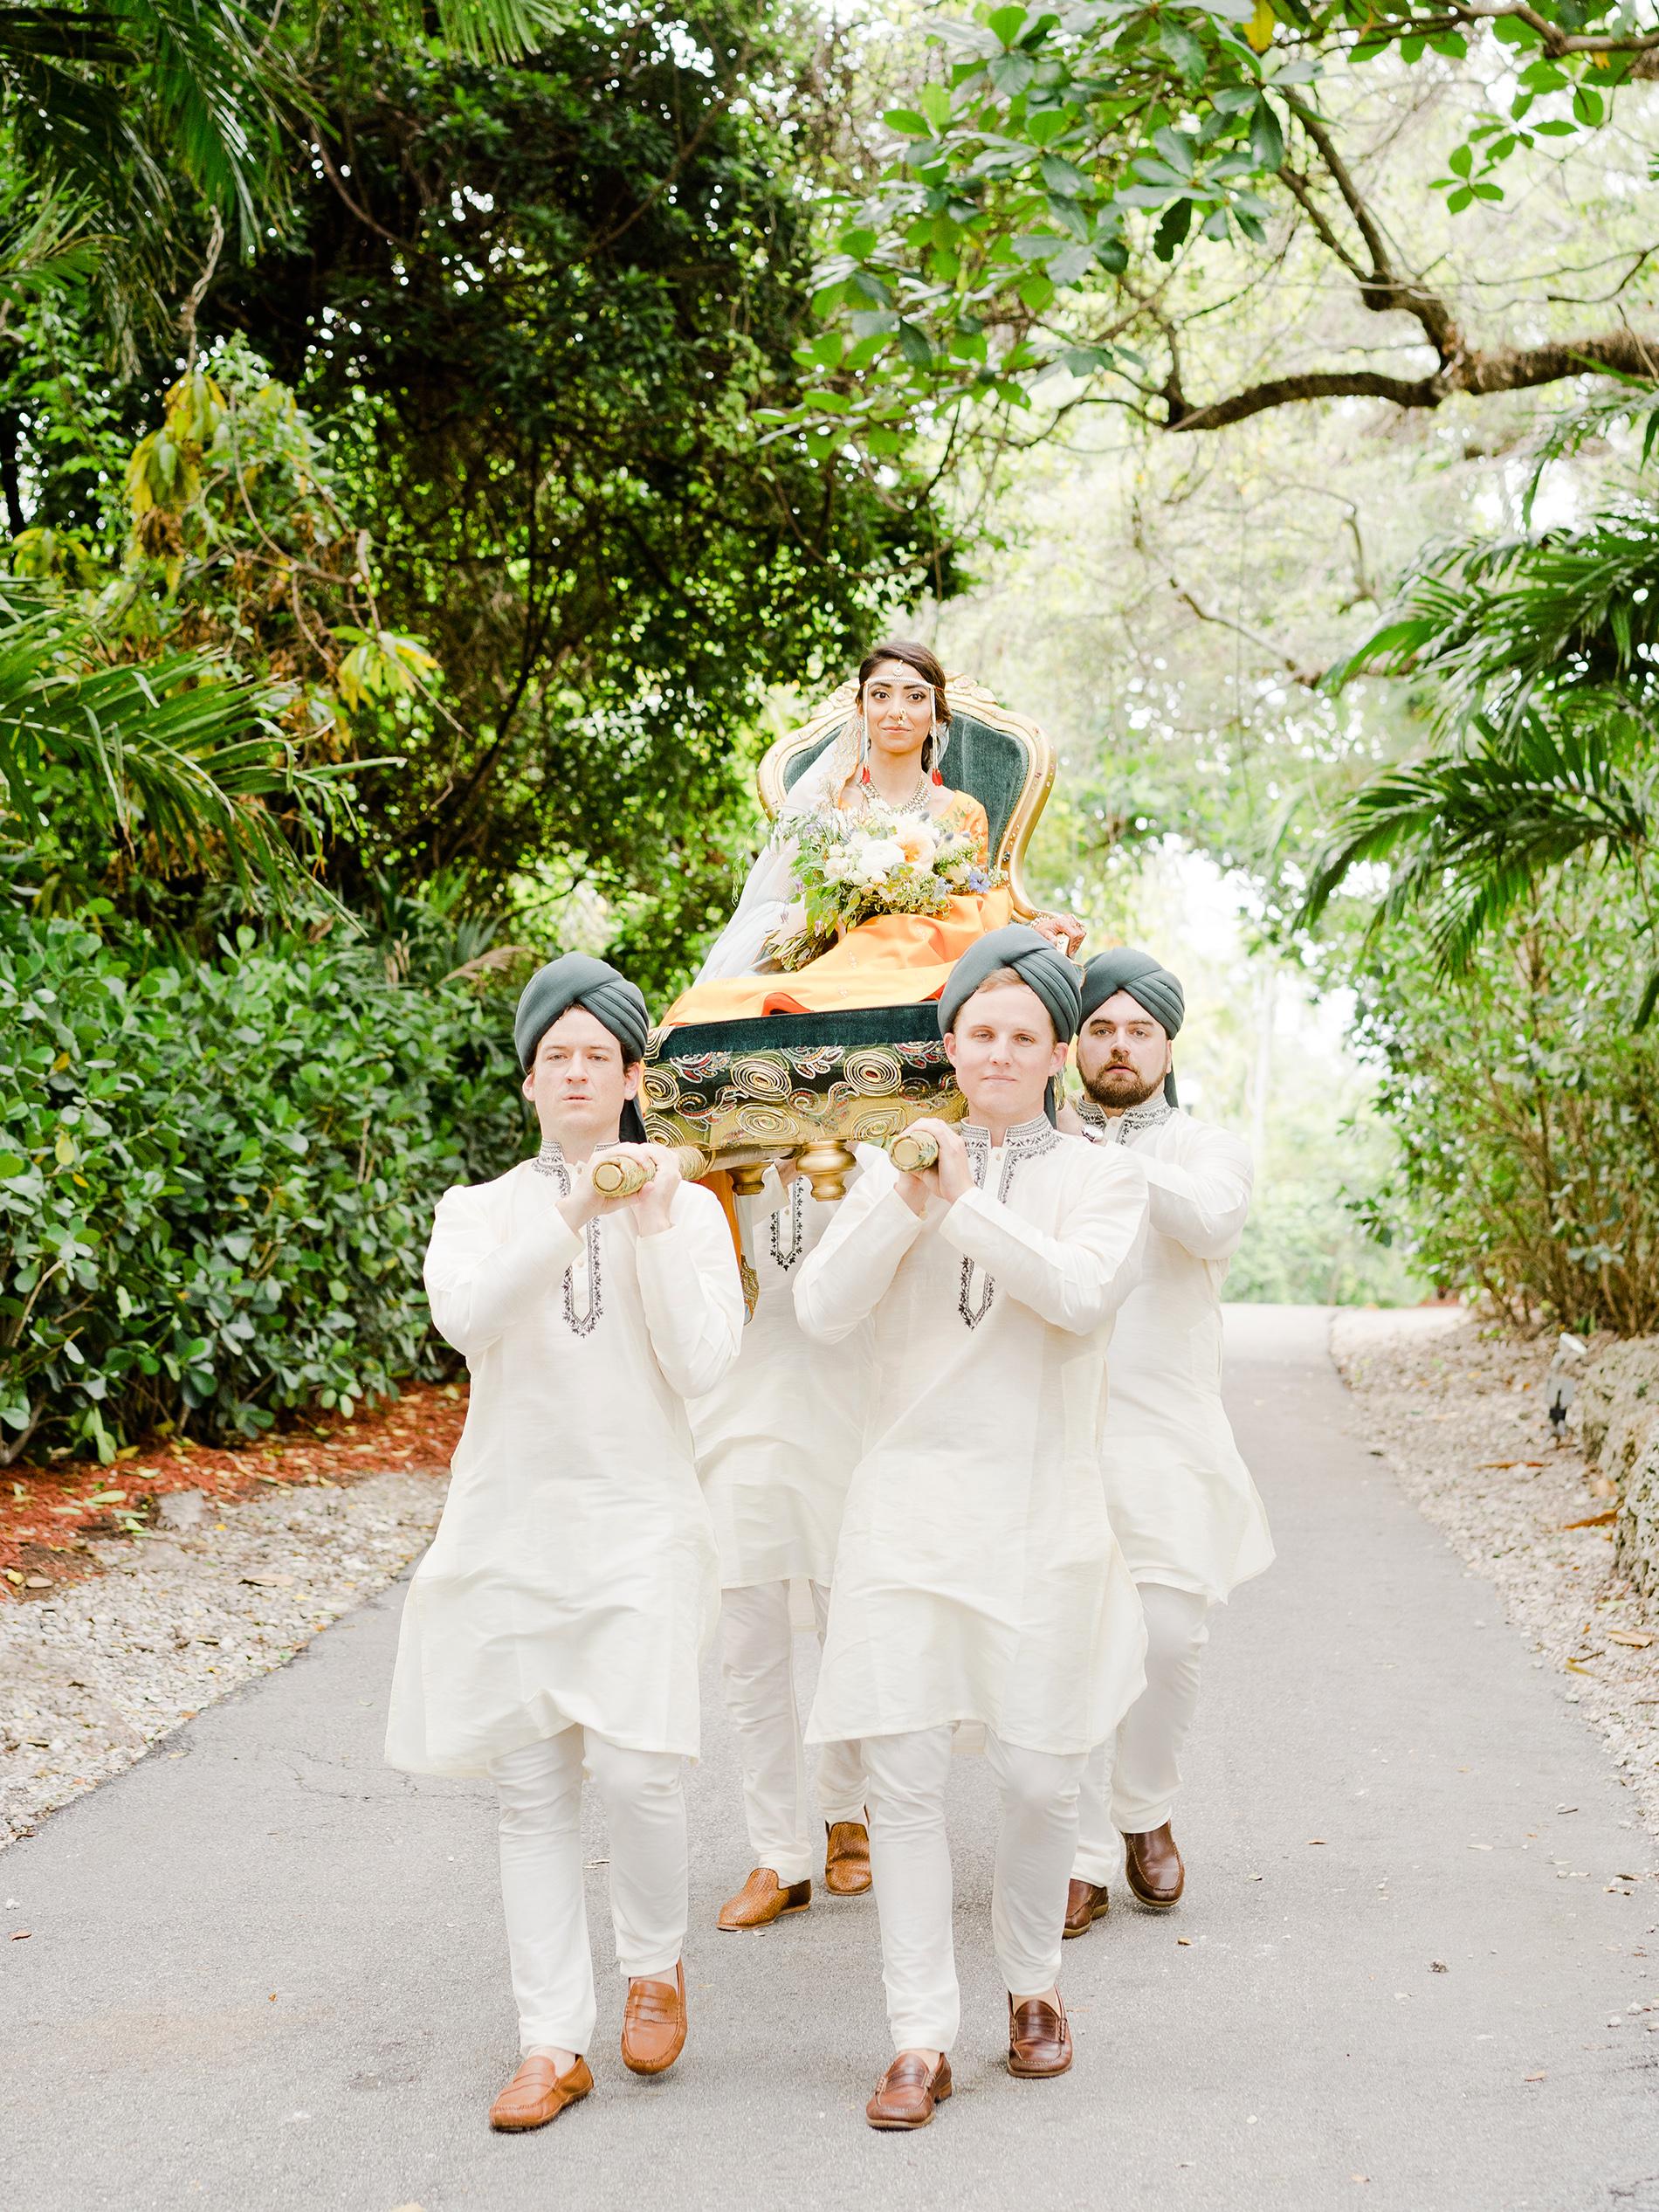 anuja nikhil wedding bride arrival